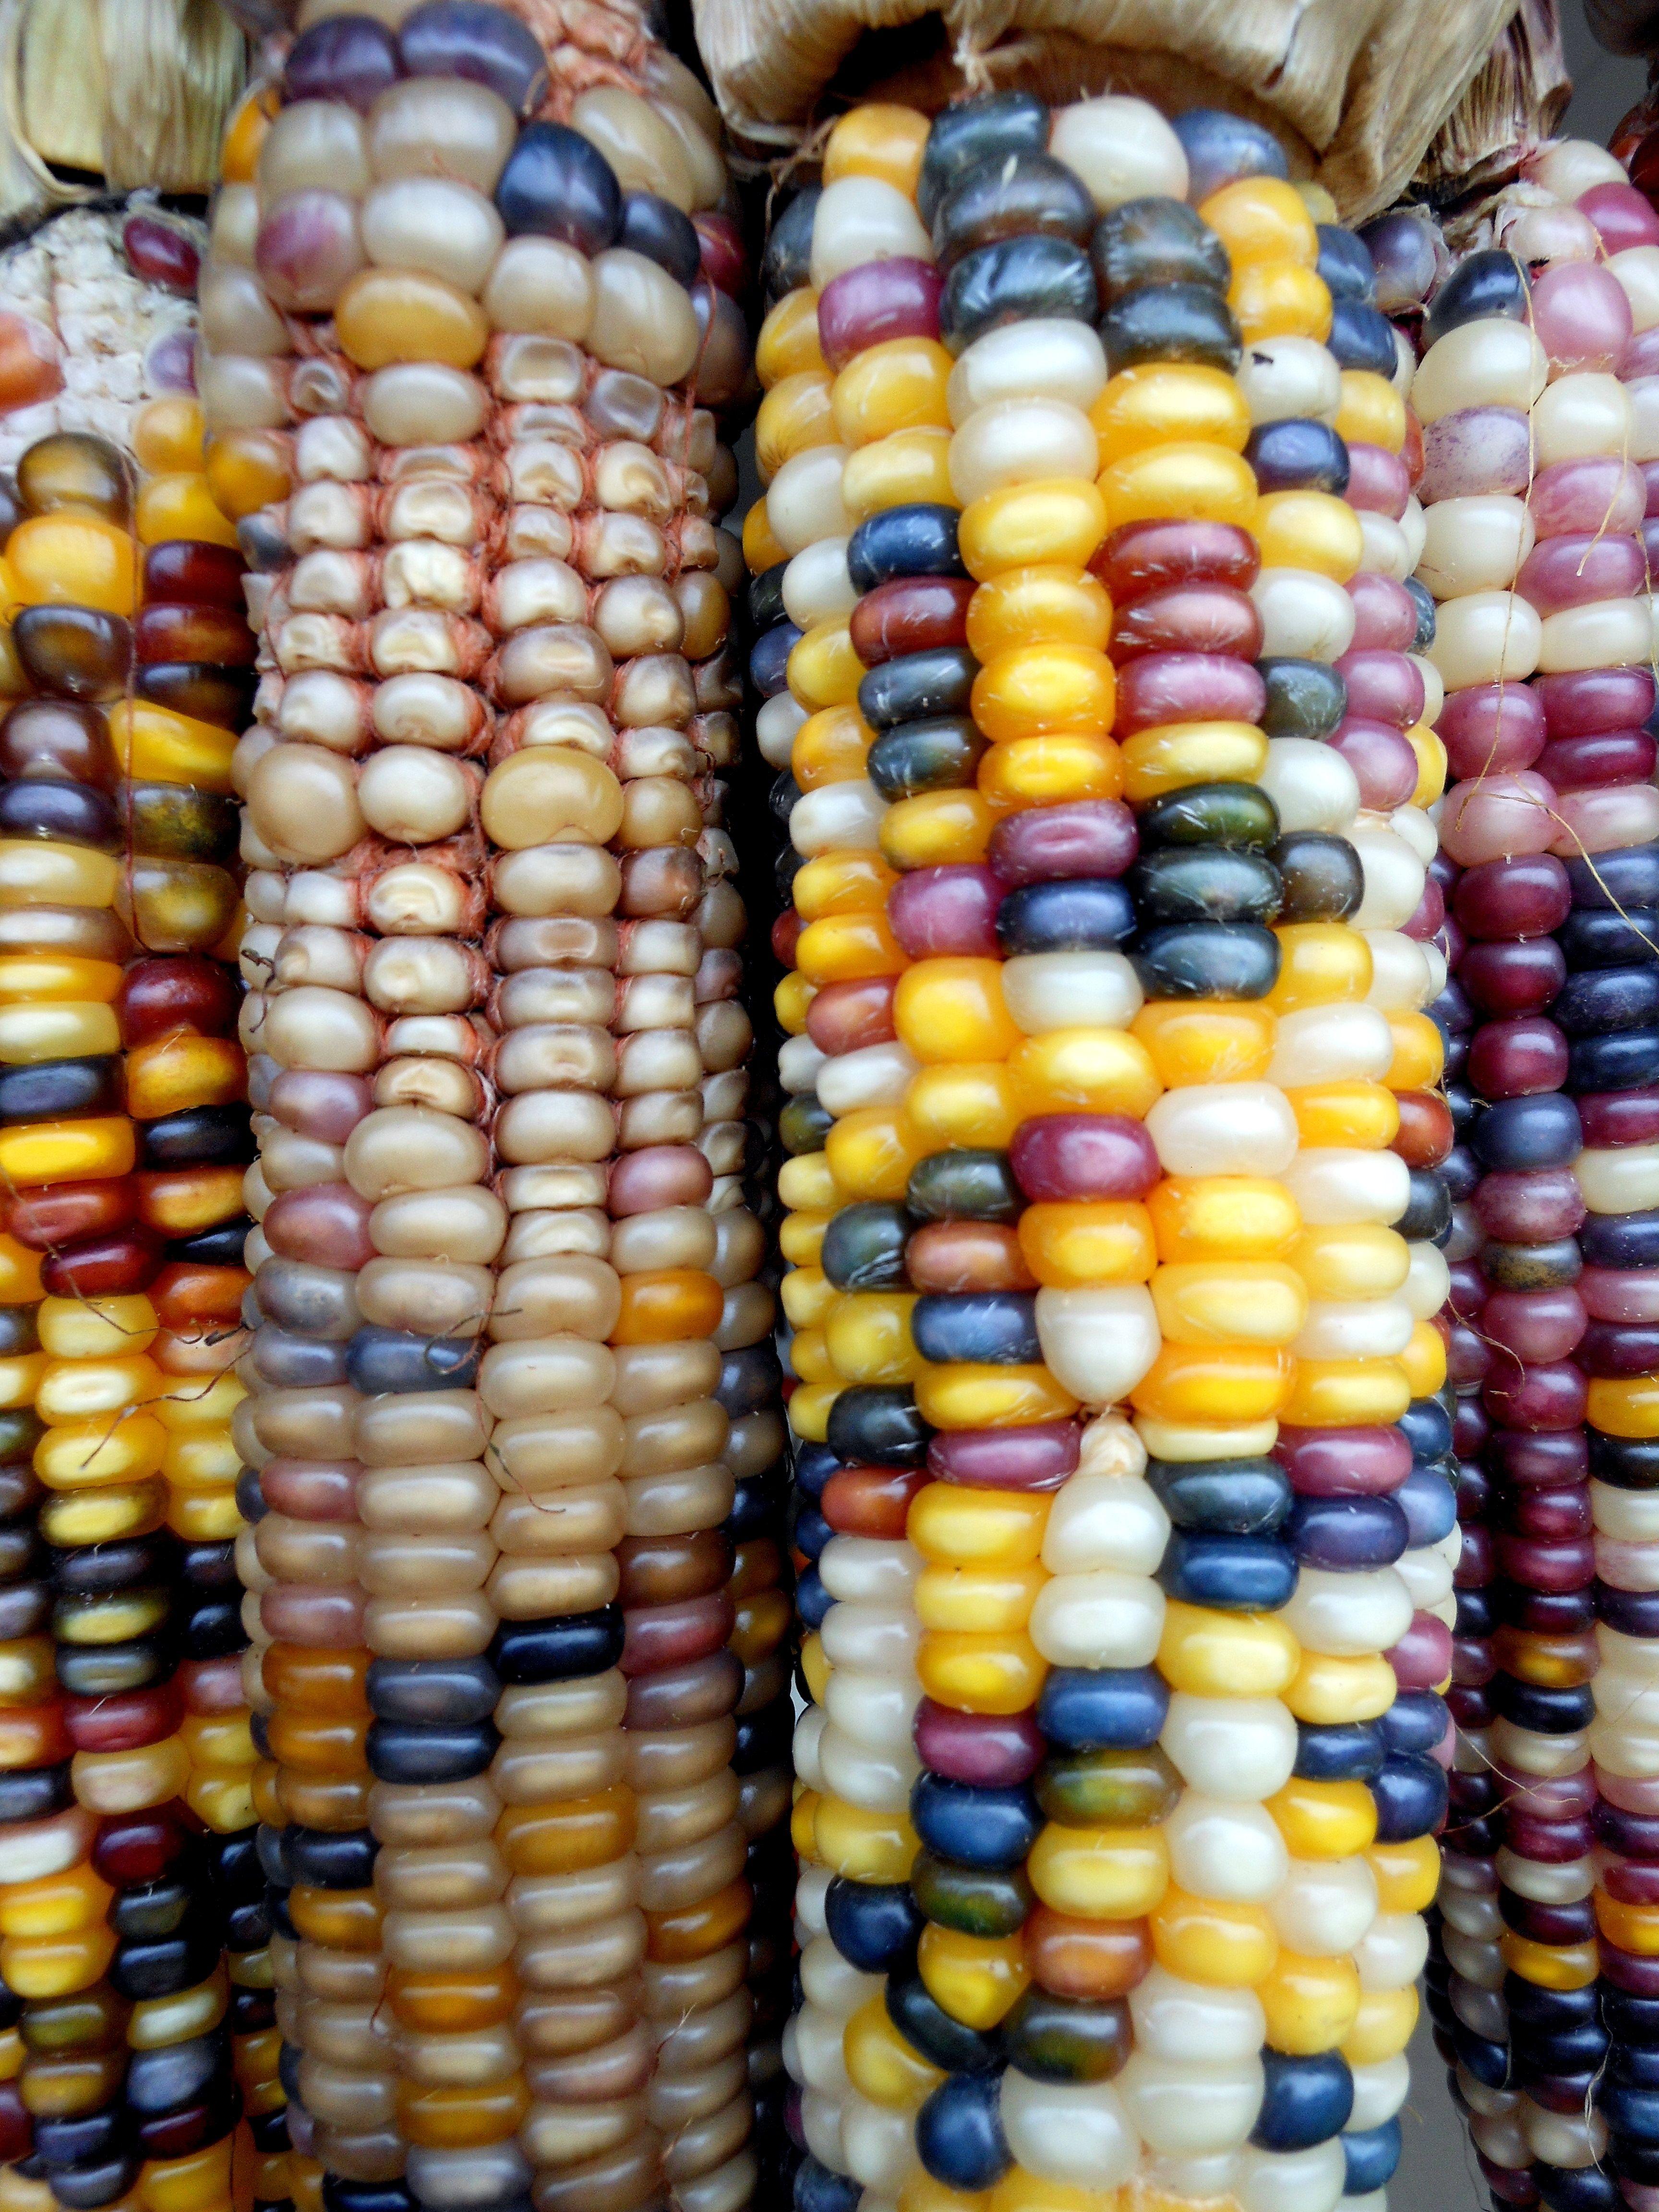 Corny | Rainbow corn, Indian corn, Corny